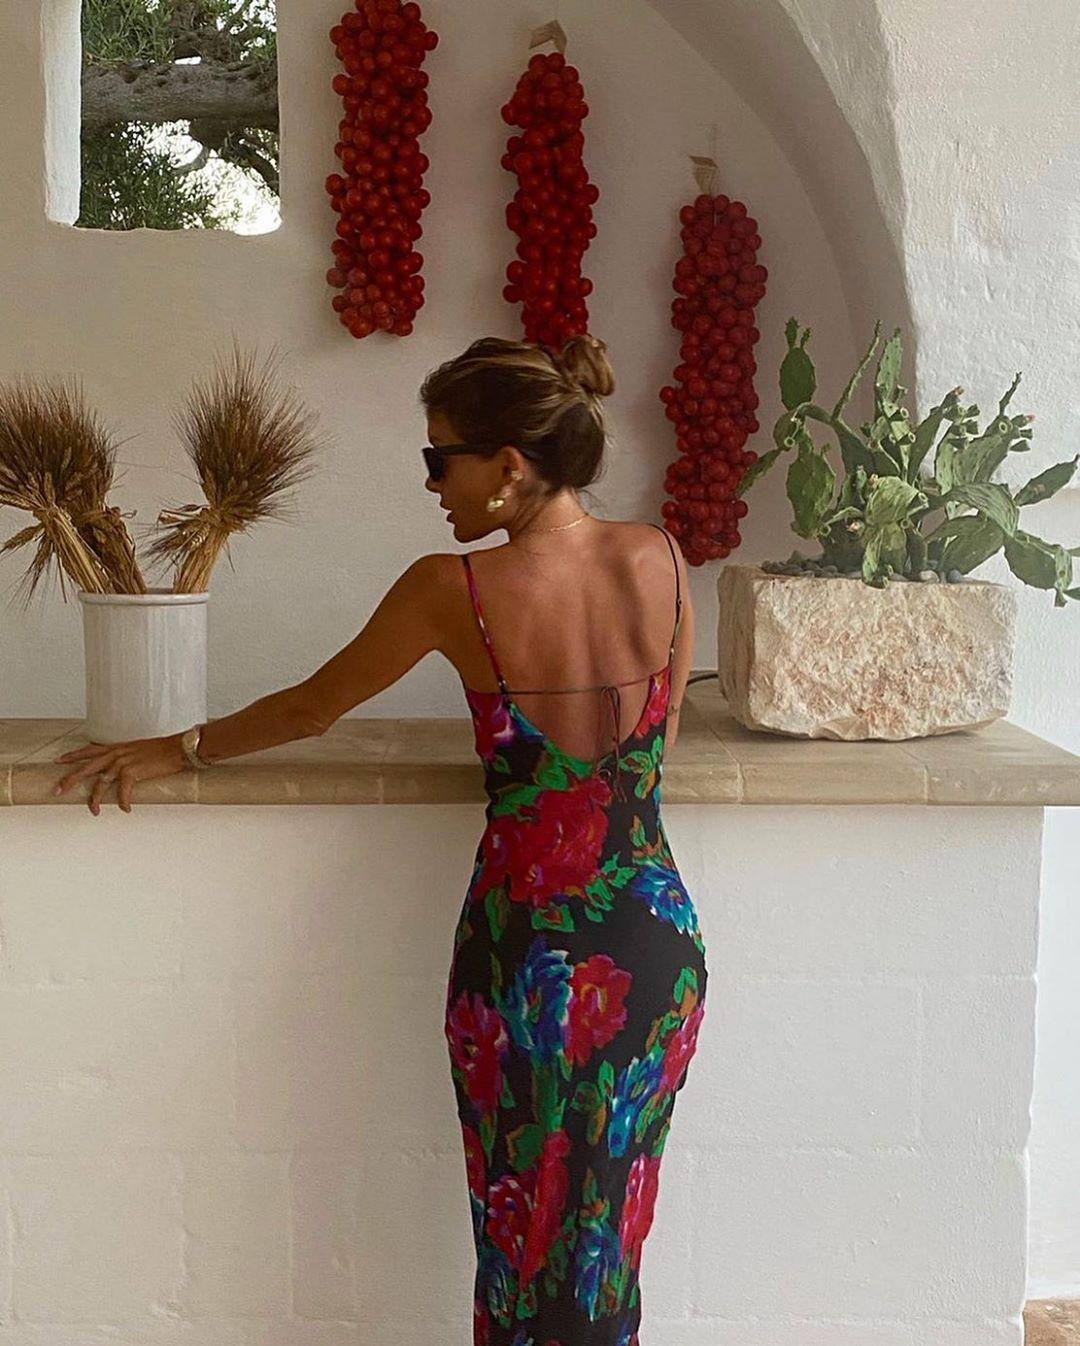 Valentina @valentina_muntoni wearing our 'Casablanca' dress in Puglia 🥀 Available online now #ratandboa